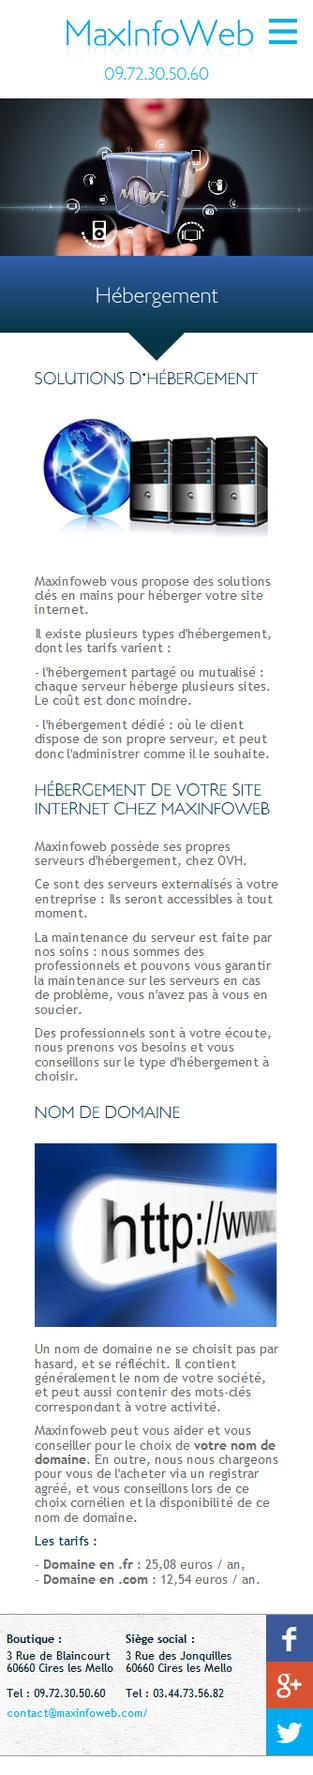 Maxinfoweb - Page hébergement smartphone